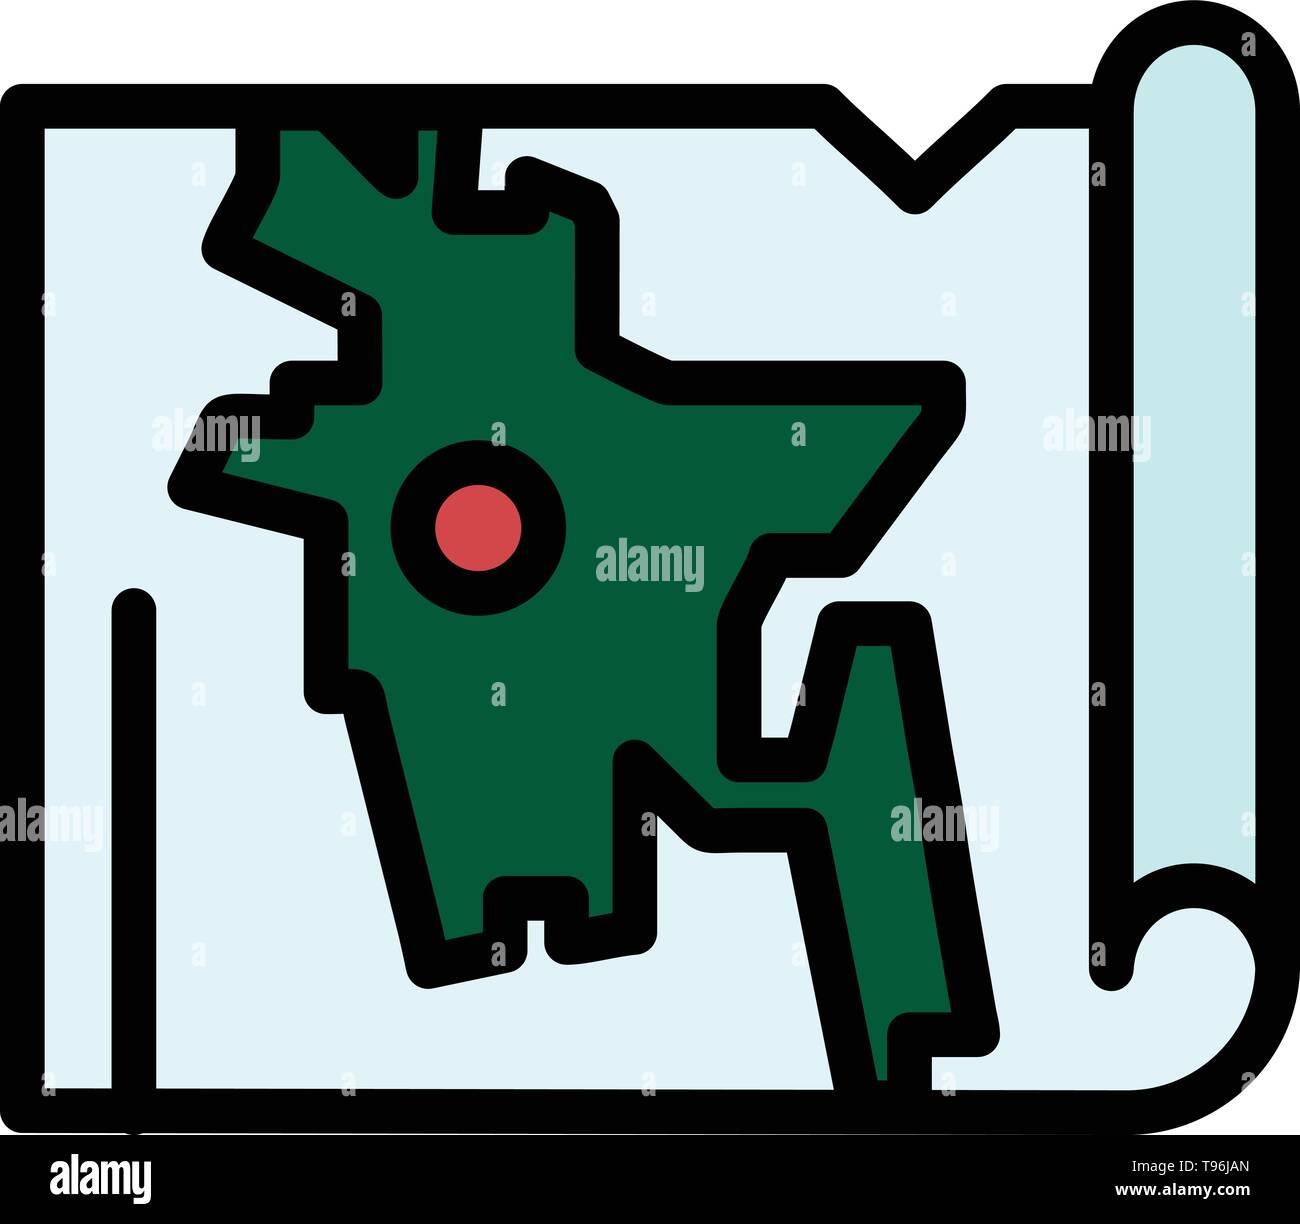 Bangladesh, Map, World, Bangla  Flat Color Icon. Vector icon banner Template - Stock Image